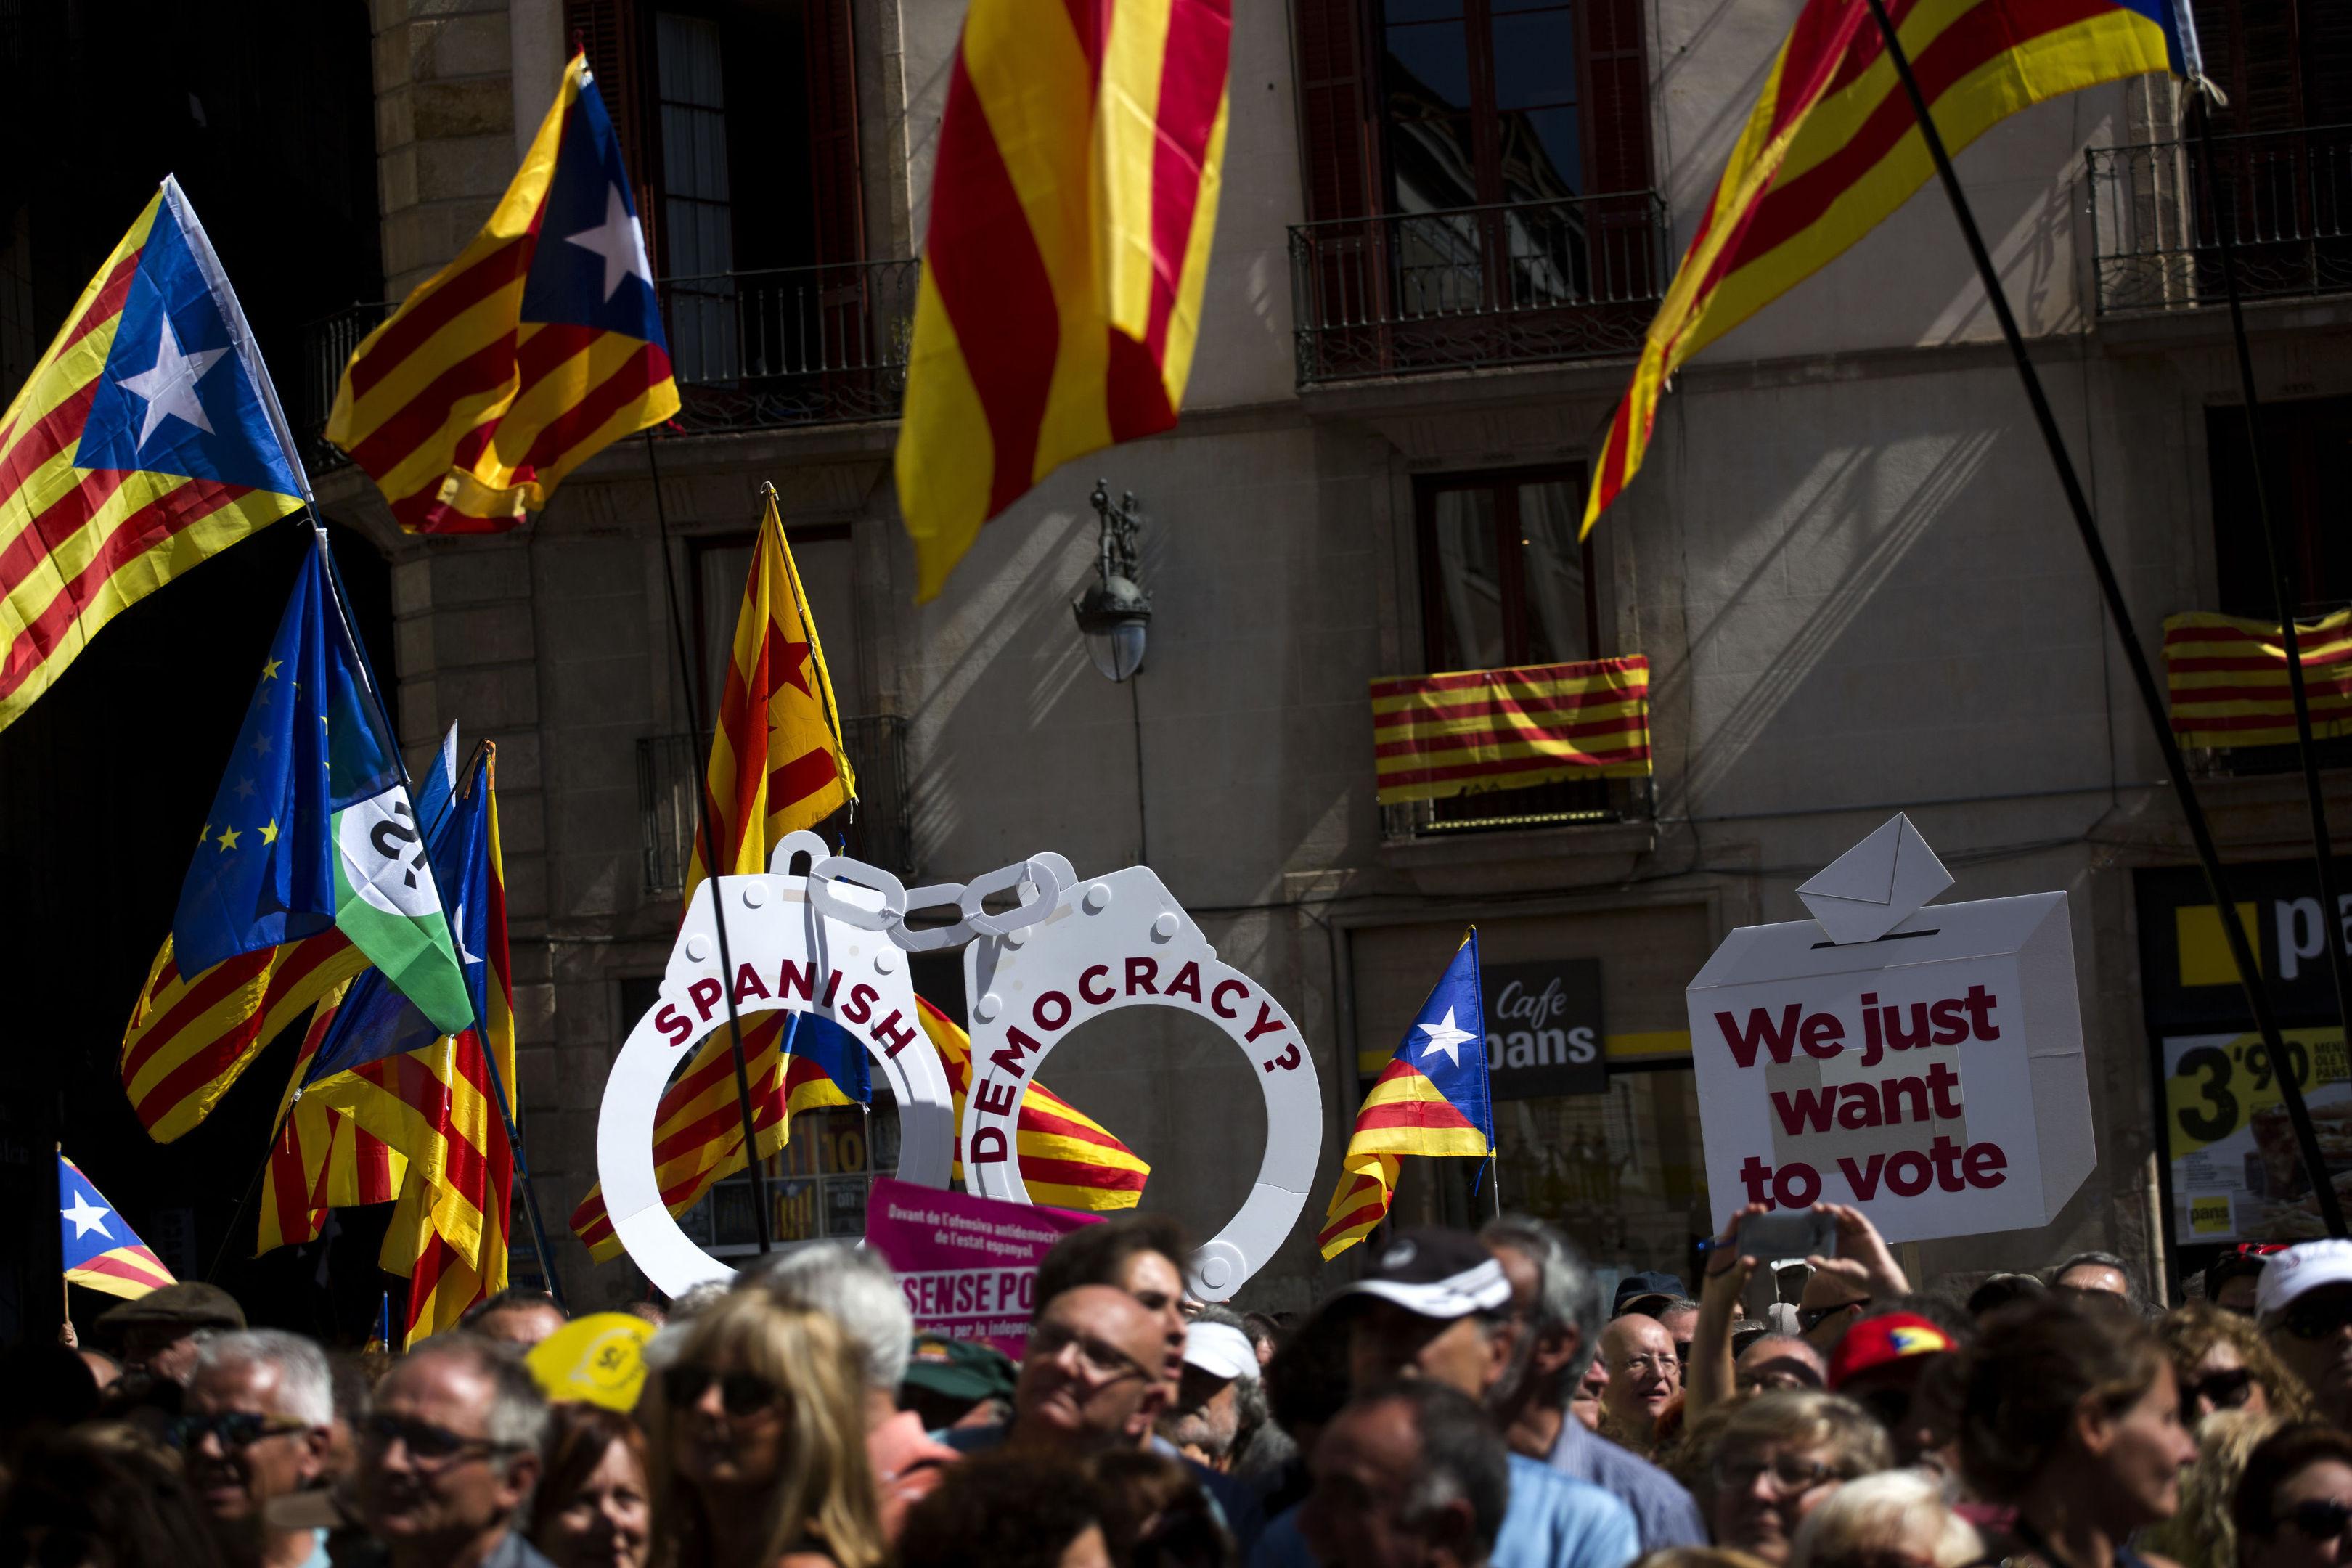 Catalan independence supporters (AP Photo/Emilio Morenatti)